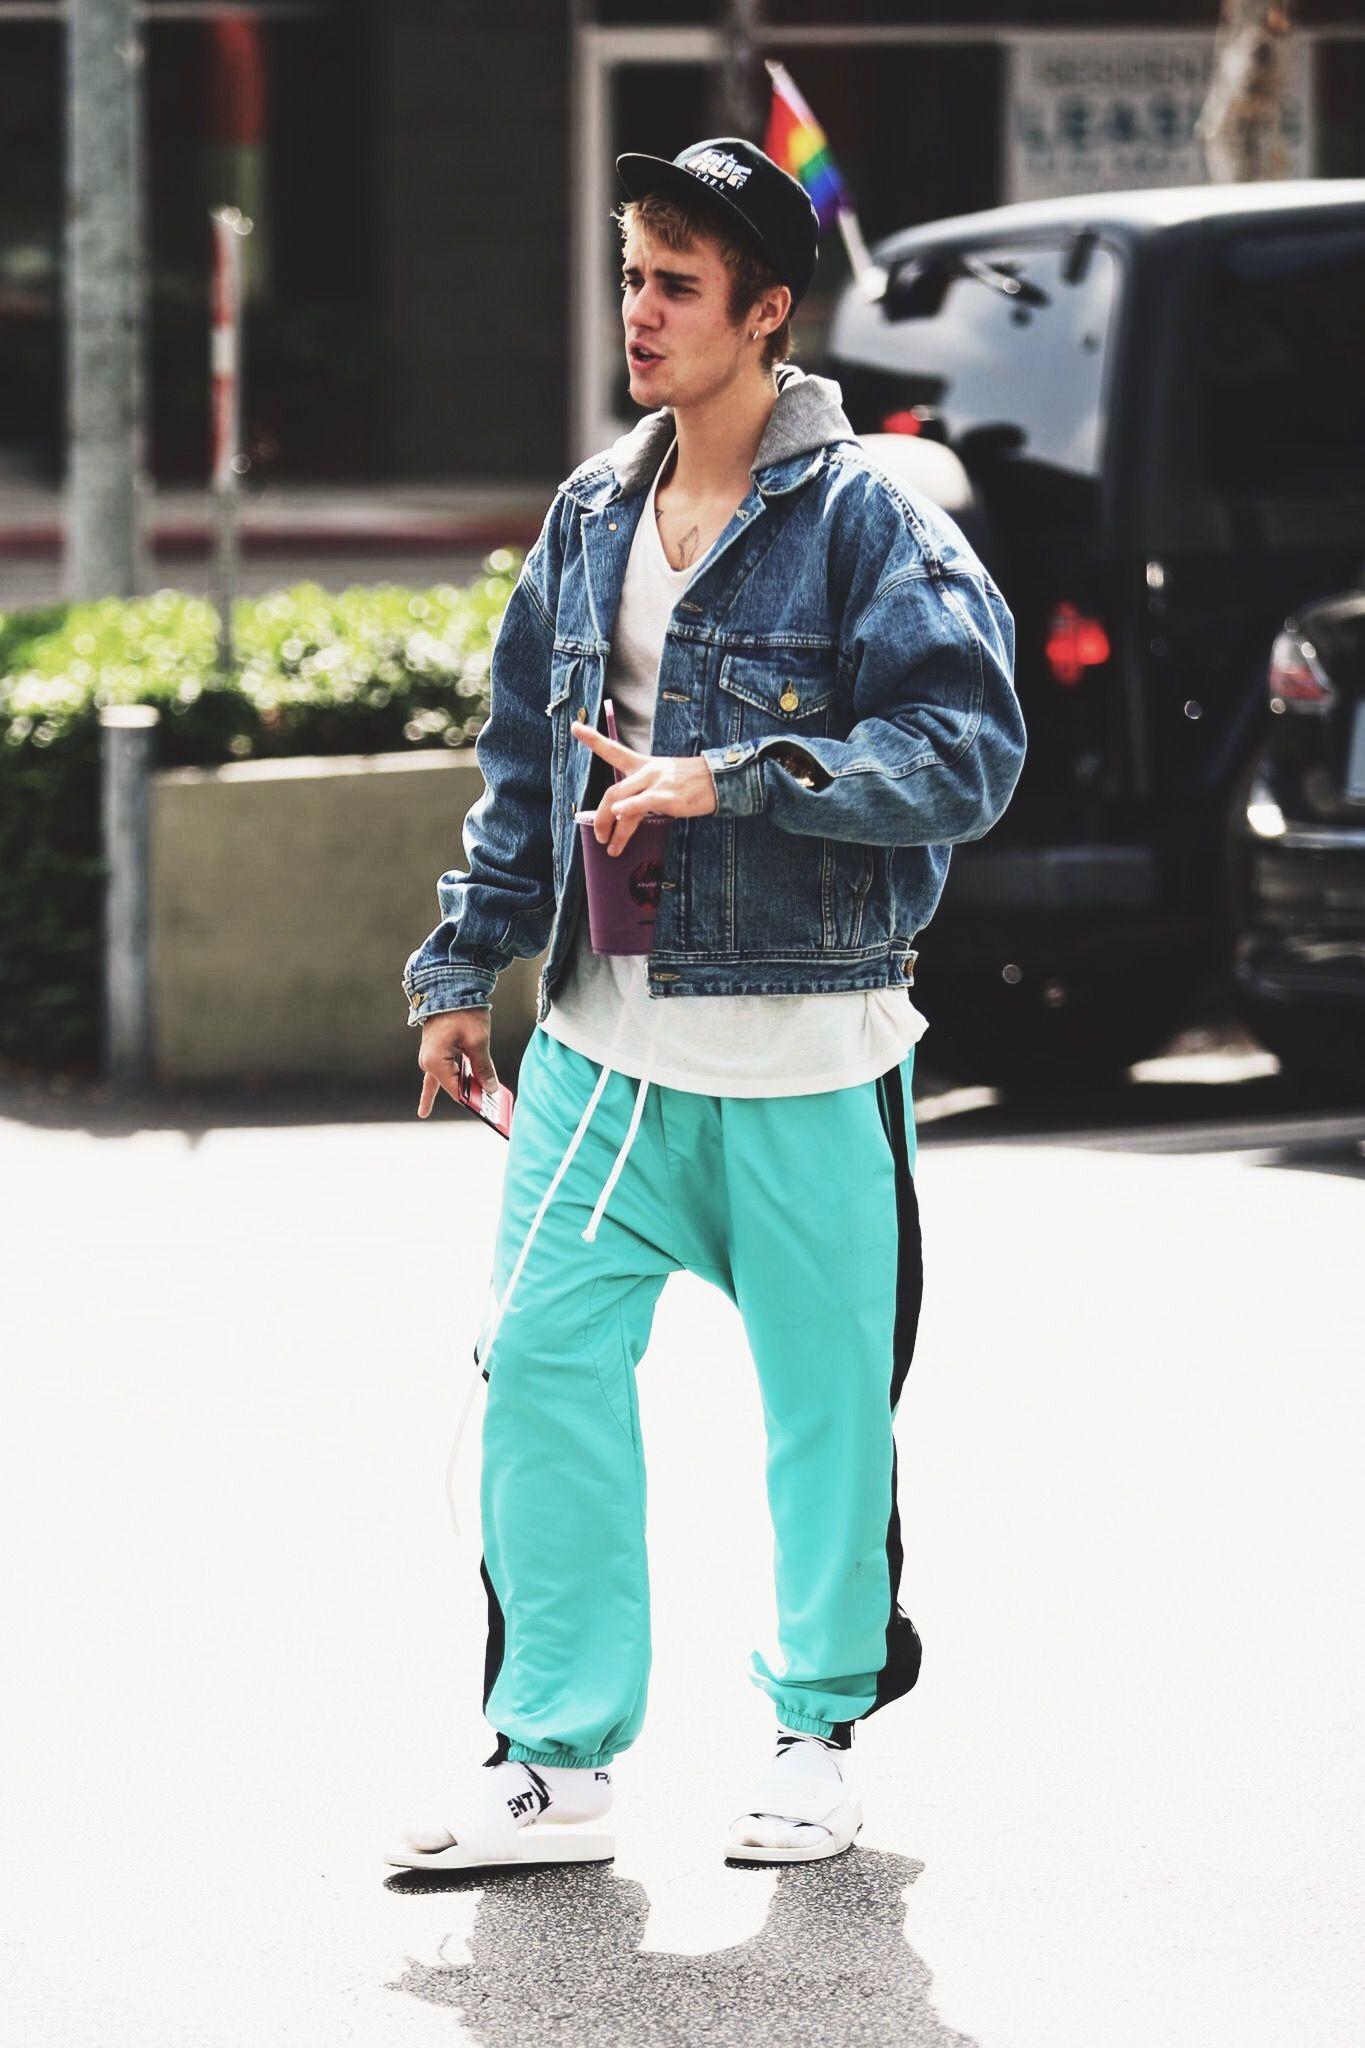 Justin Bieber outfit 2017 | Justin Bieber | Pinterest ...